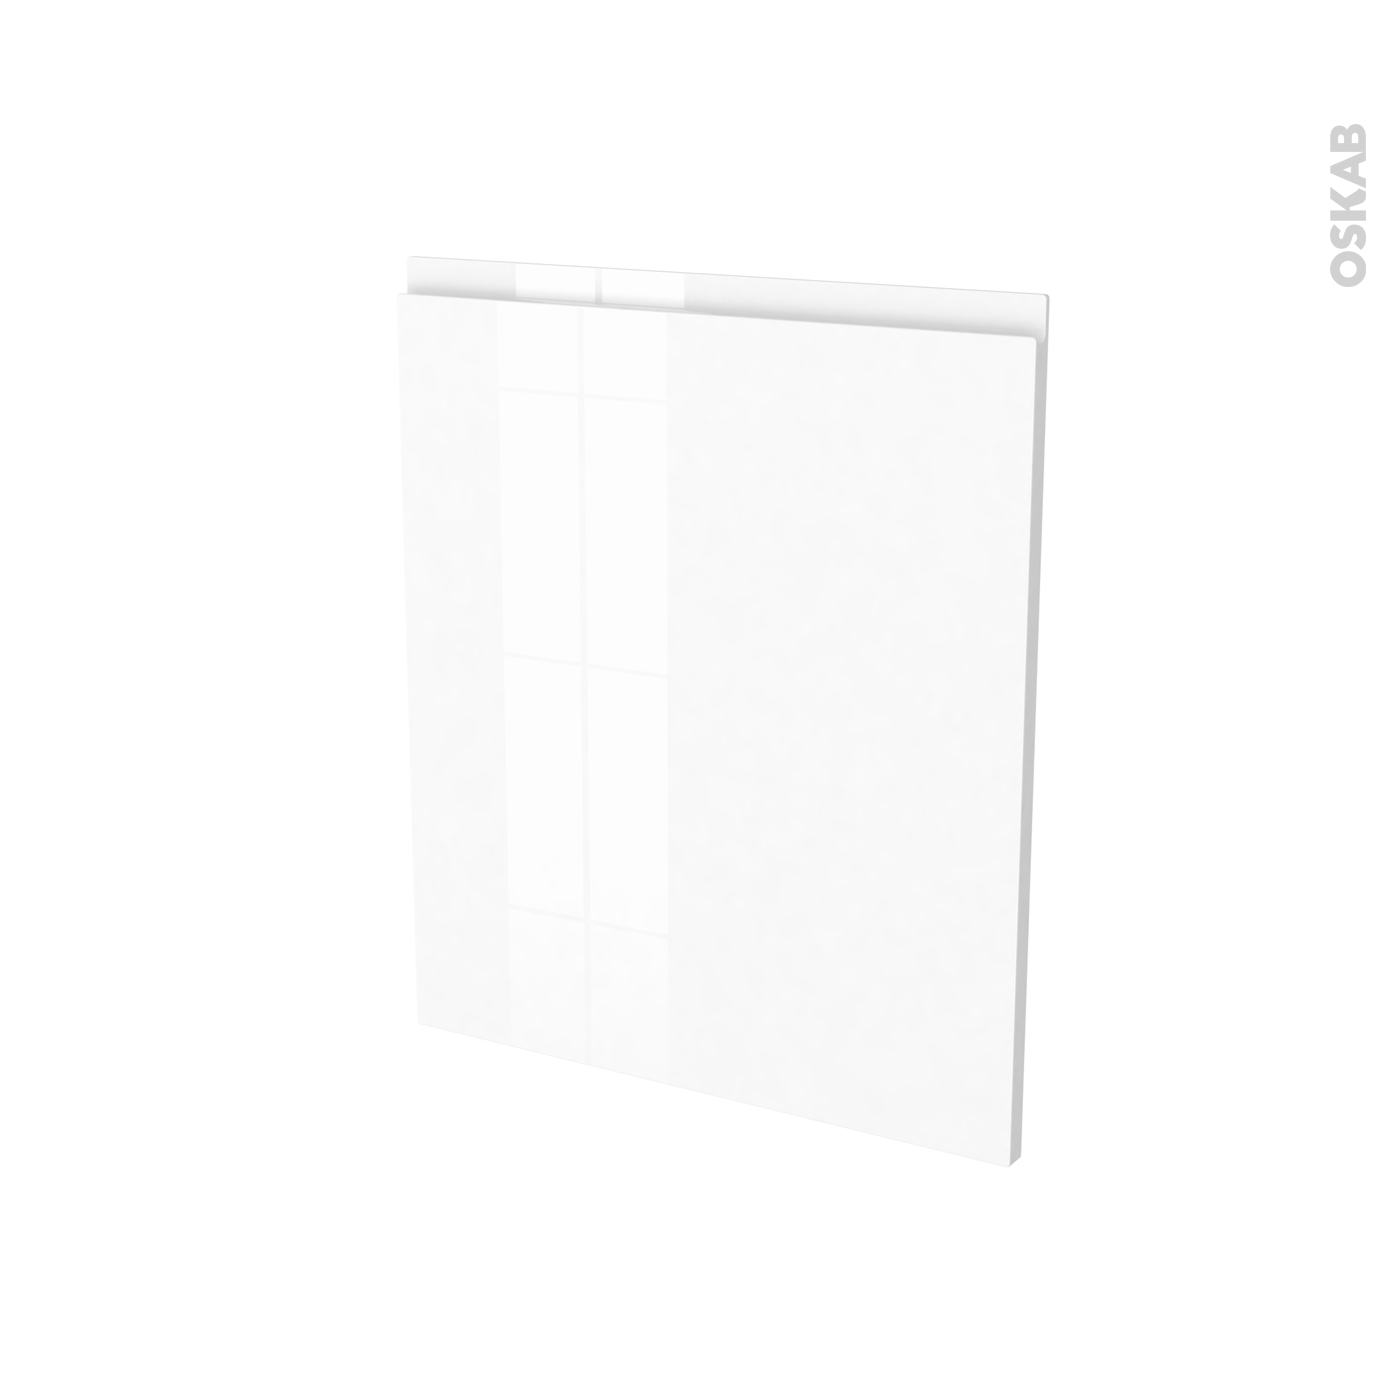 Porte Lave Vaisselle Full Intégrable N21 Ipoma Blanc Brillant L60 X H70 Cm Oskab